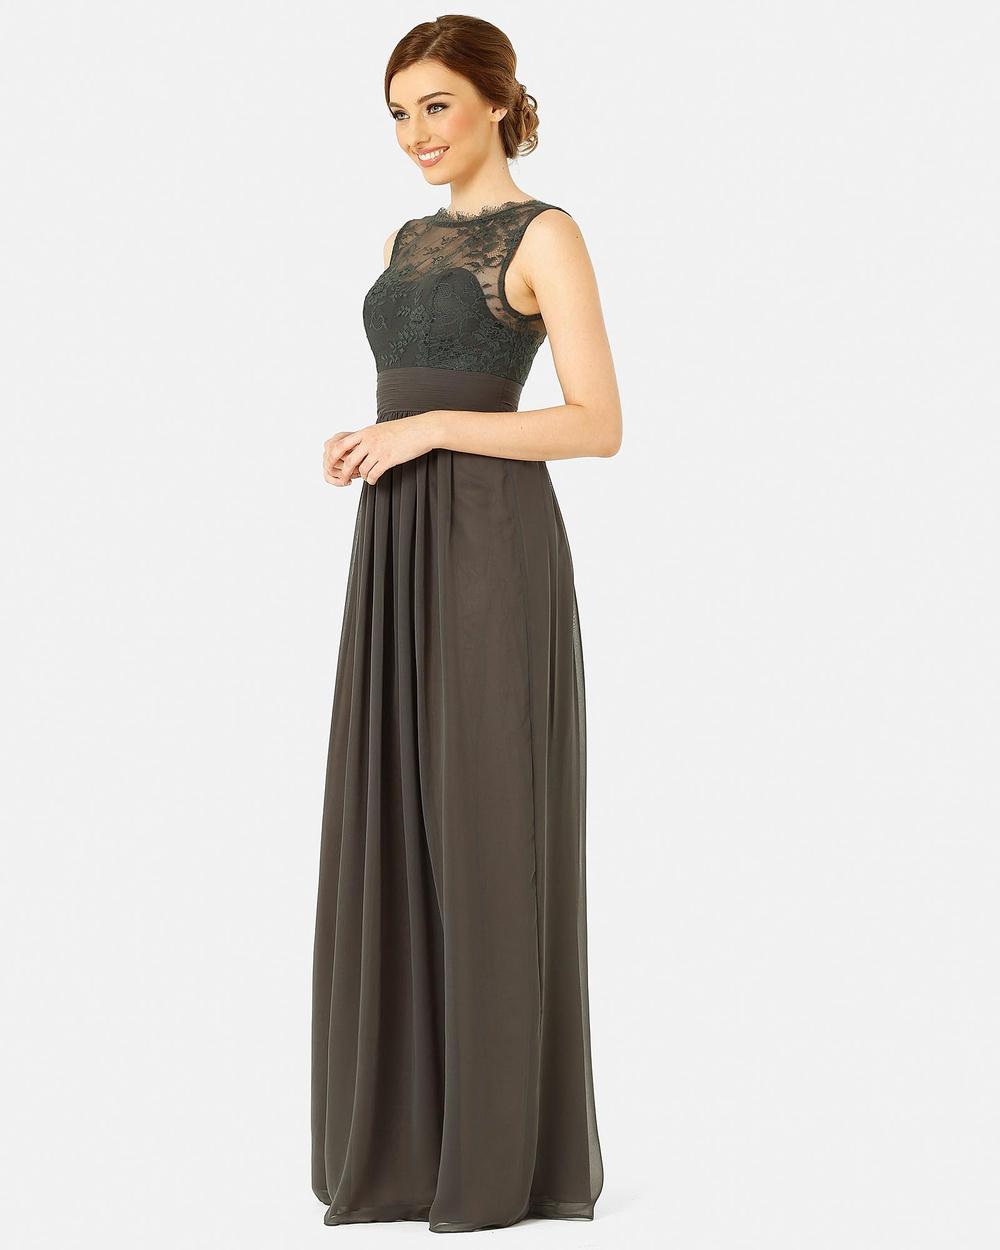 Tania Olsen Designs Charlotte Dress Bridesmaid Dresses Charcoal Charlotte Dress